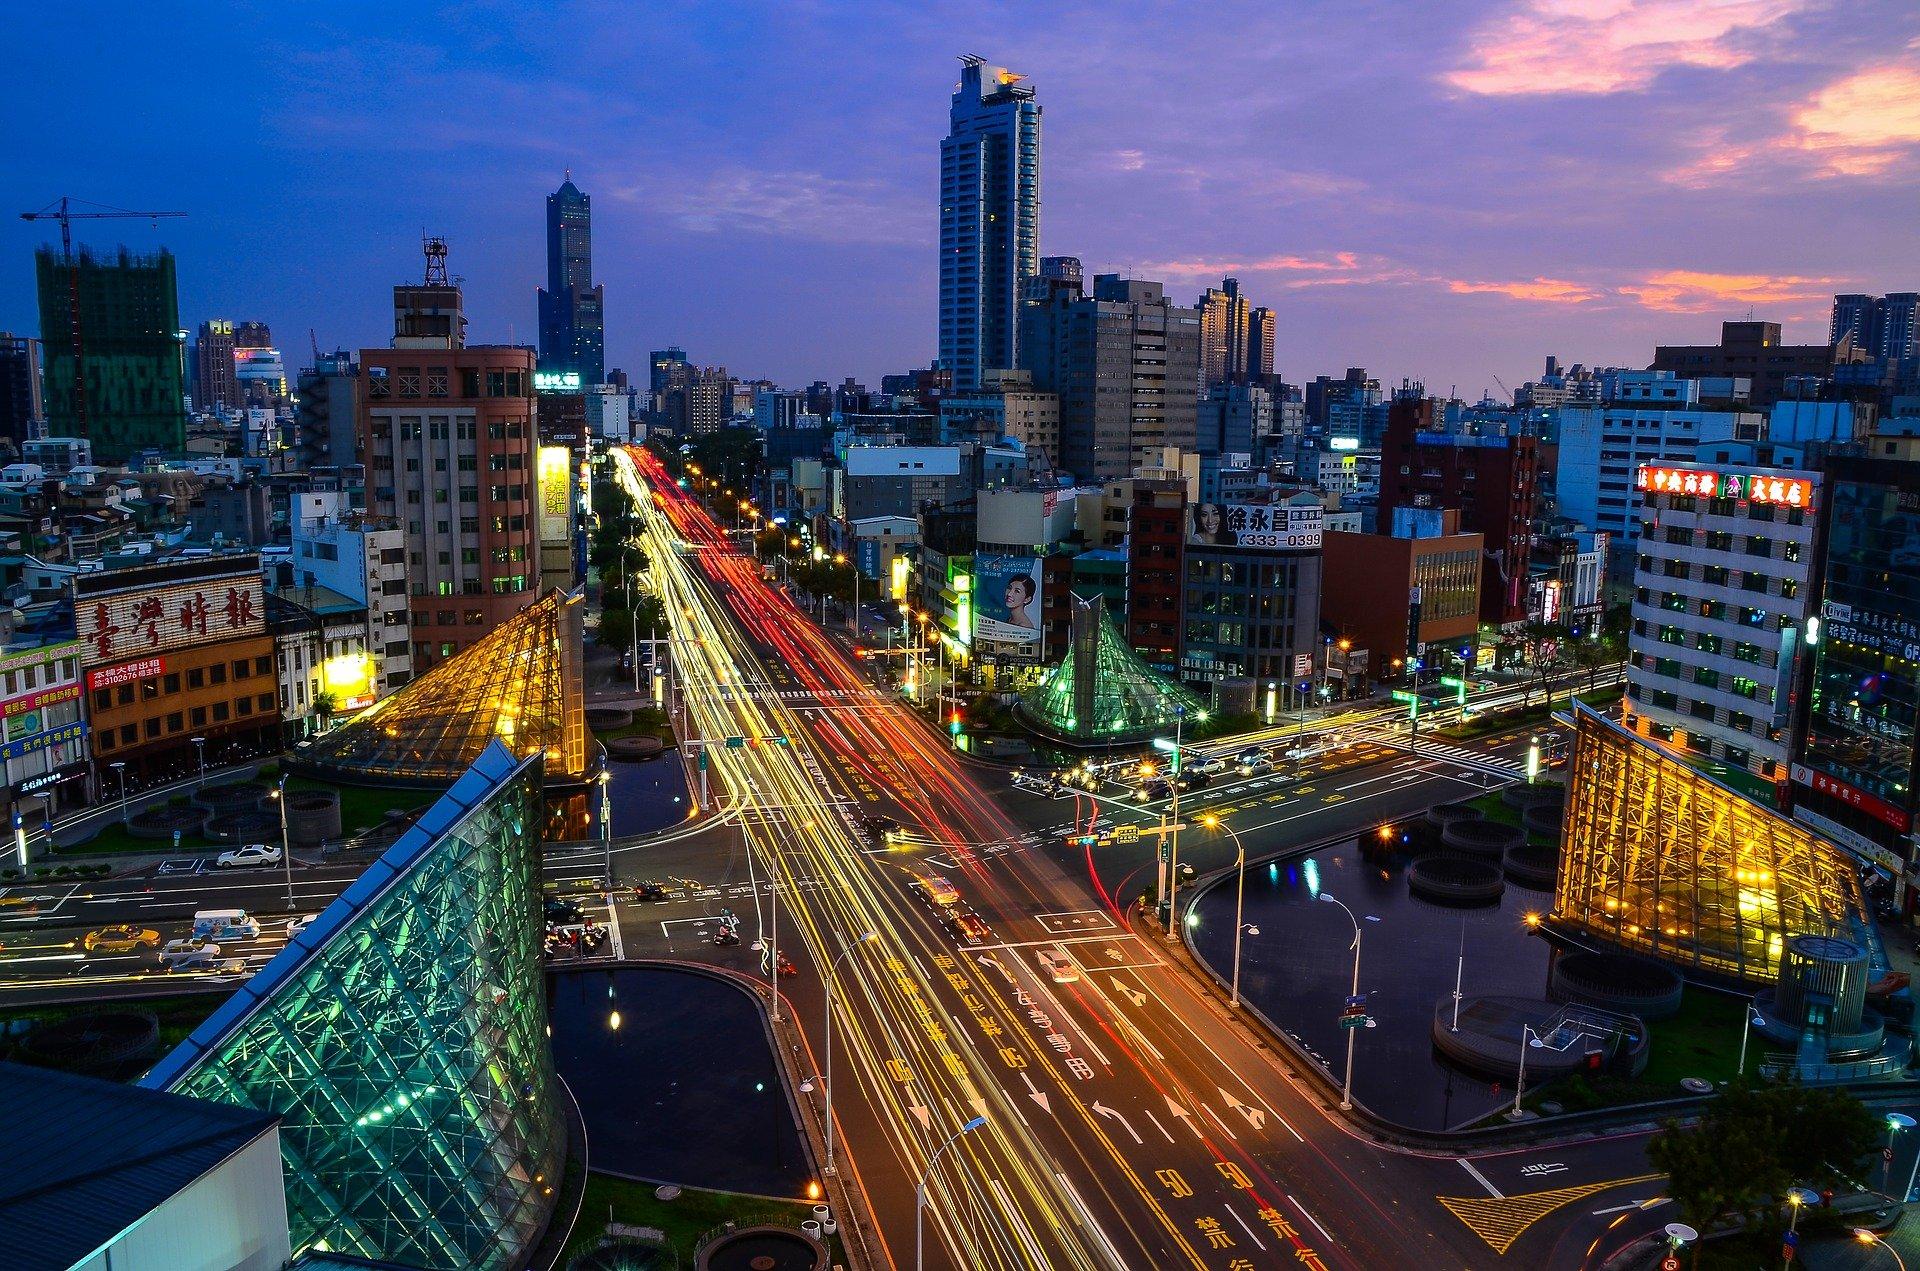 Kaohsiung, Taiwan (By tingyaoh on Pixabay)